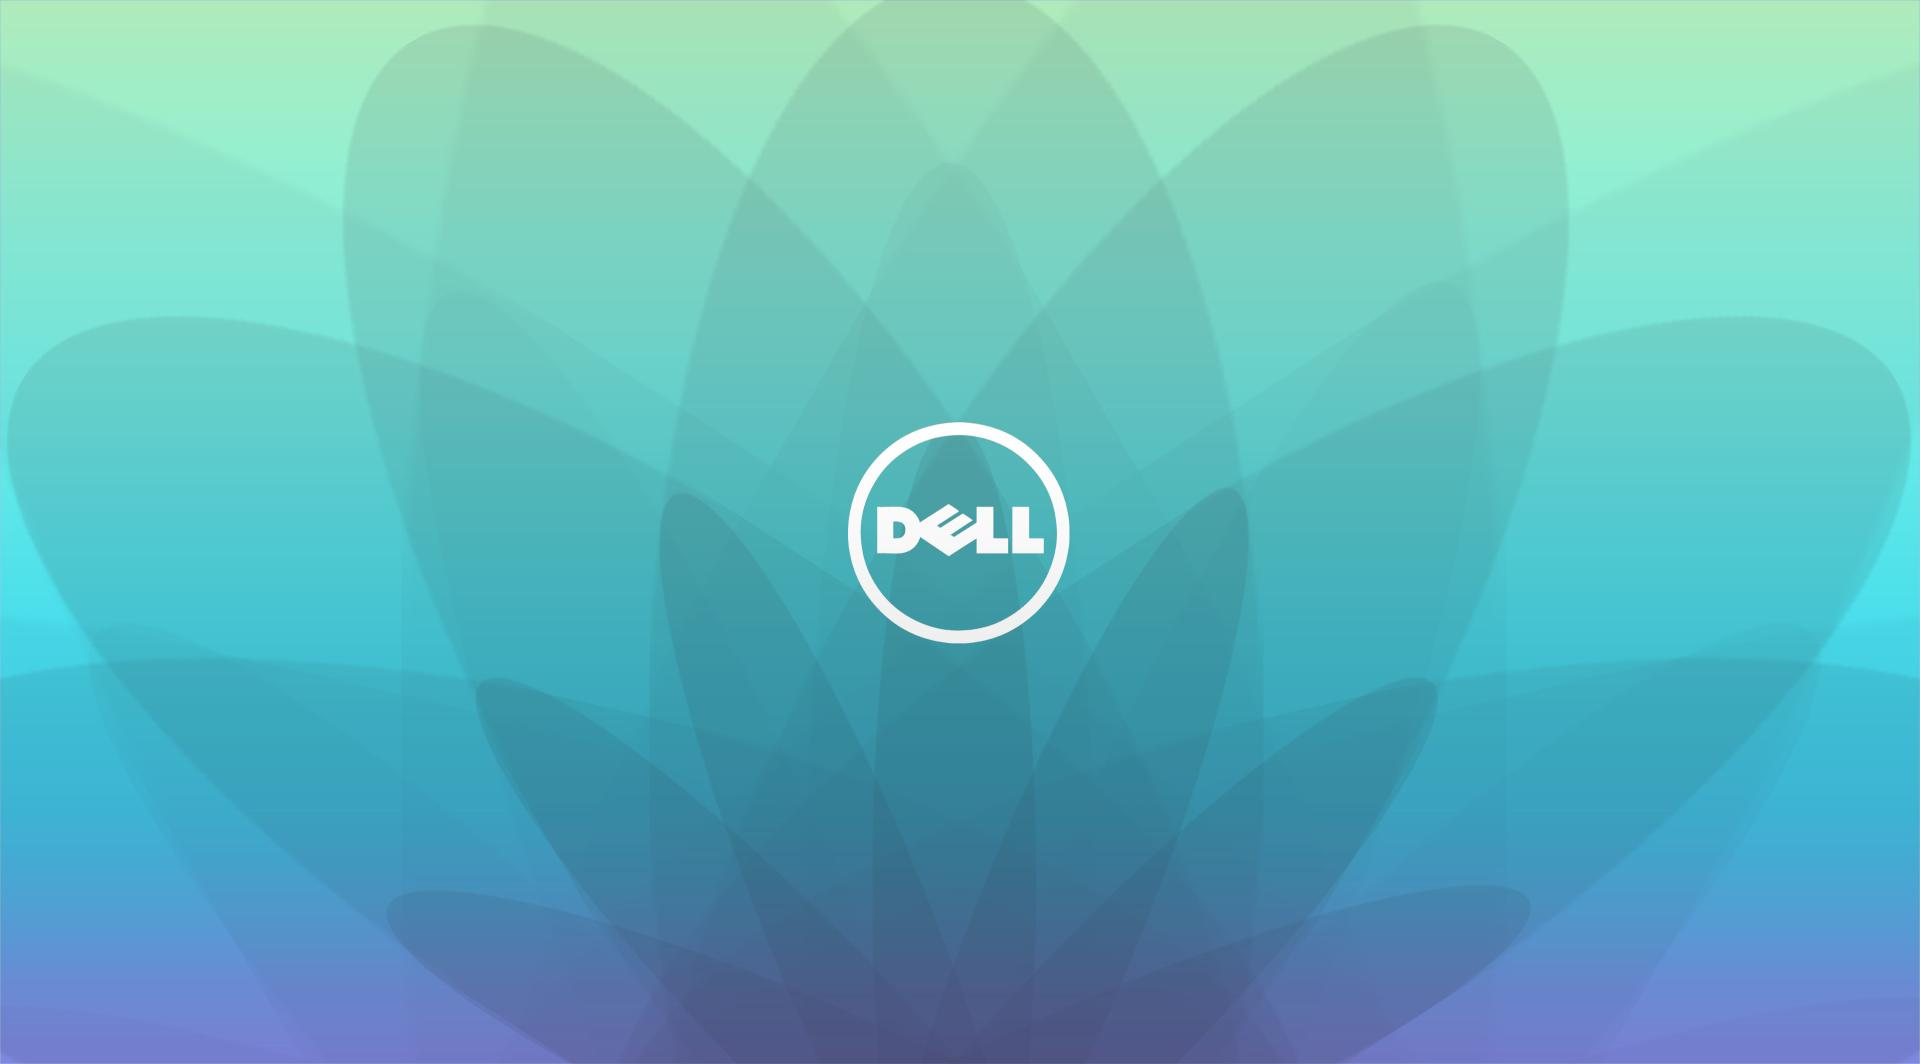 Dell Wallpaper HD Download